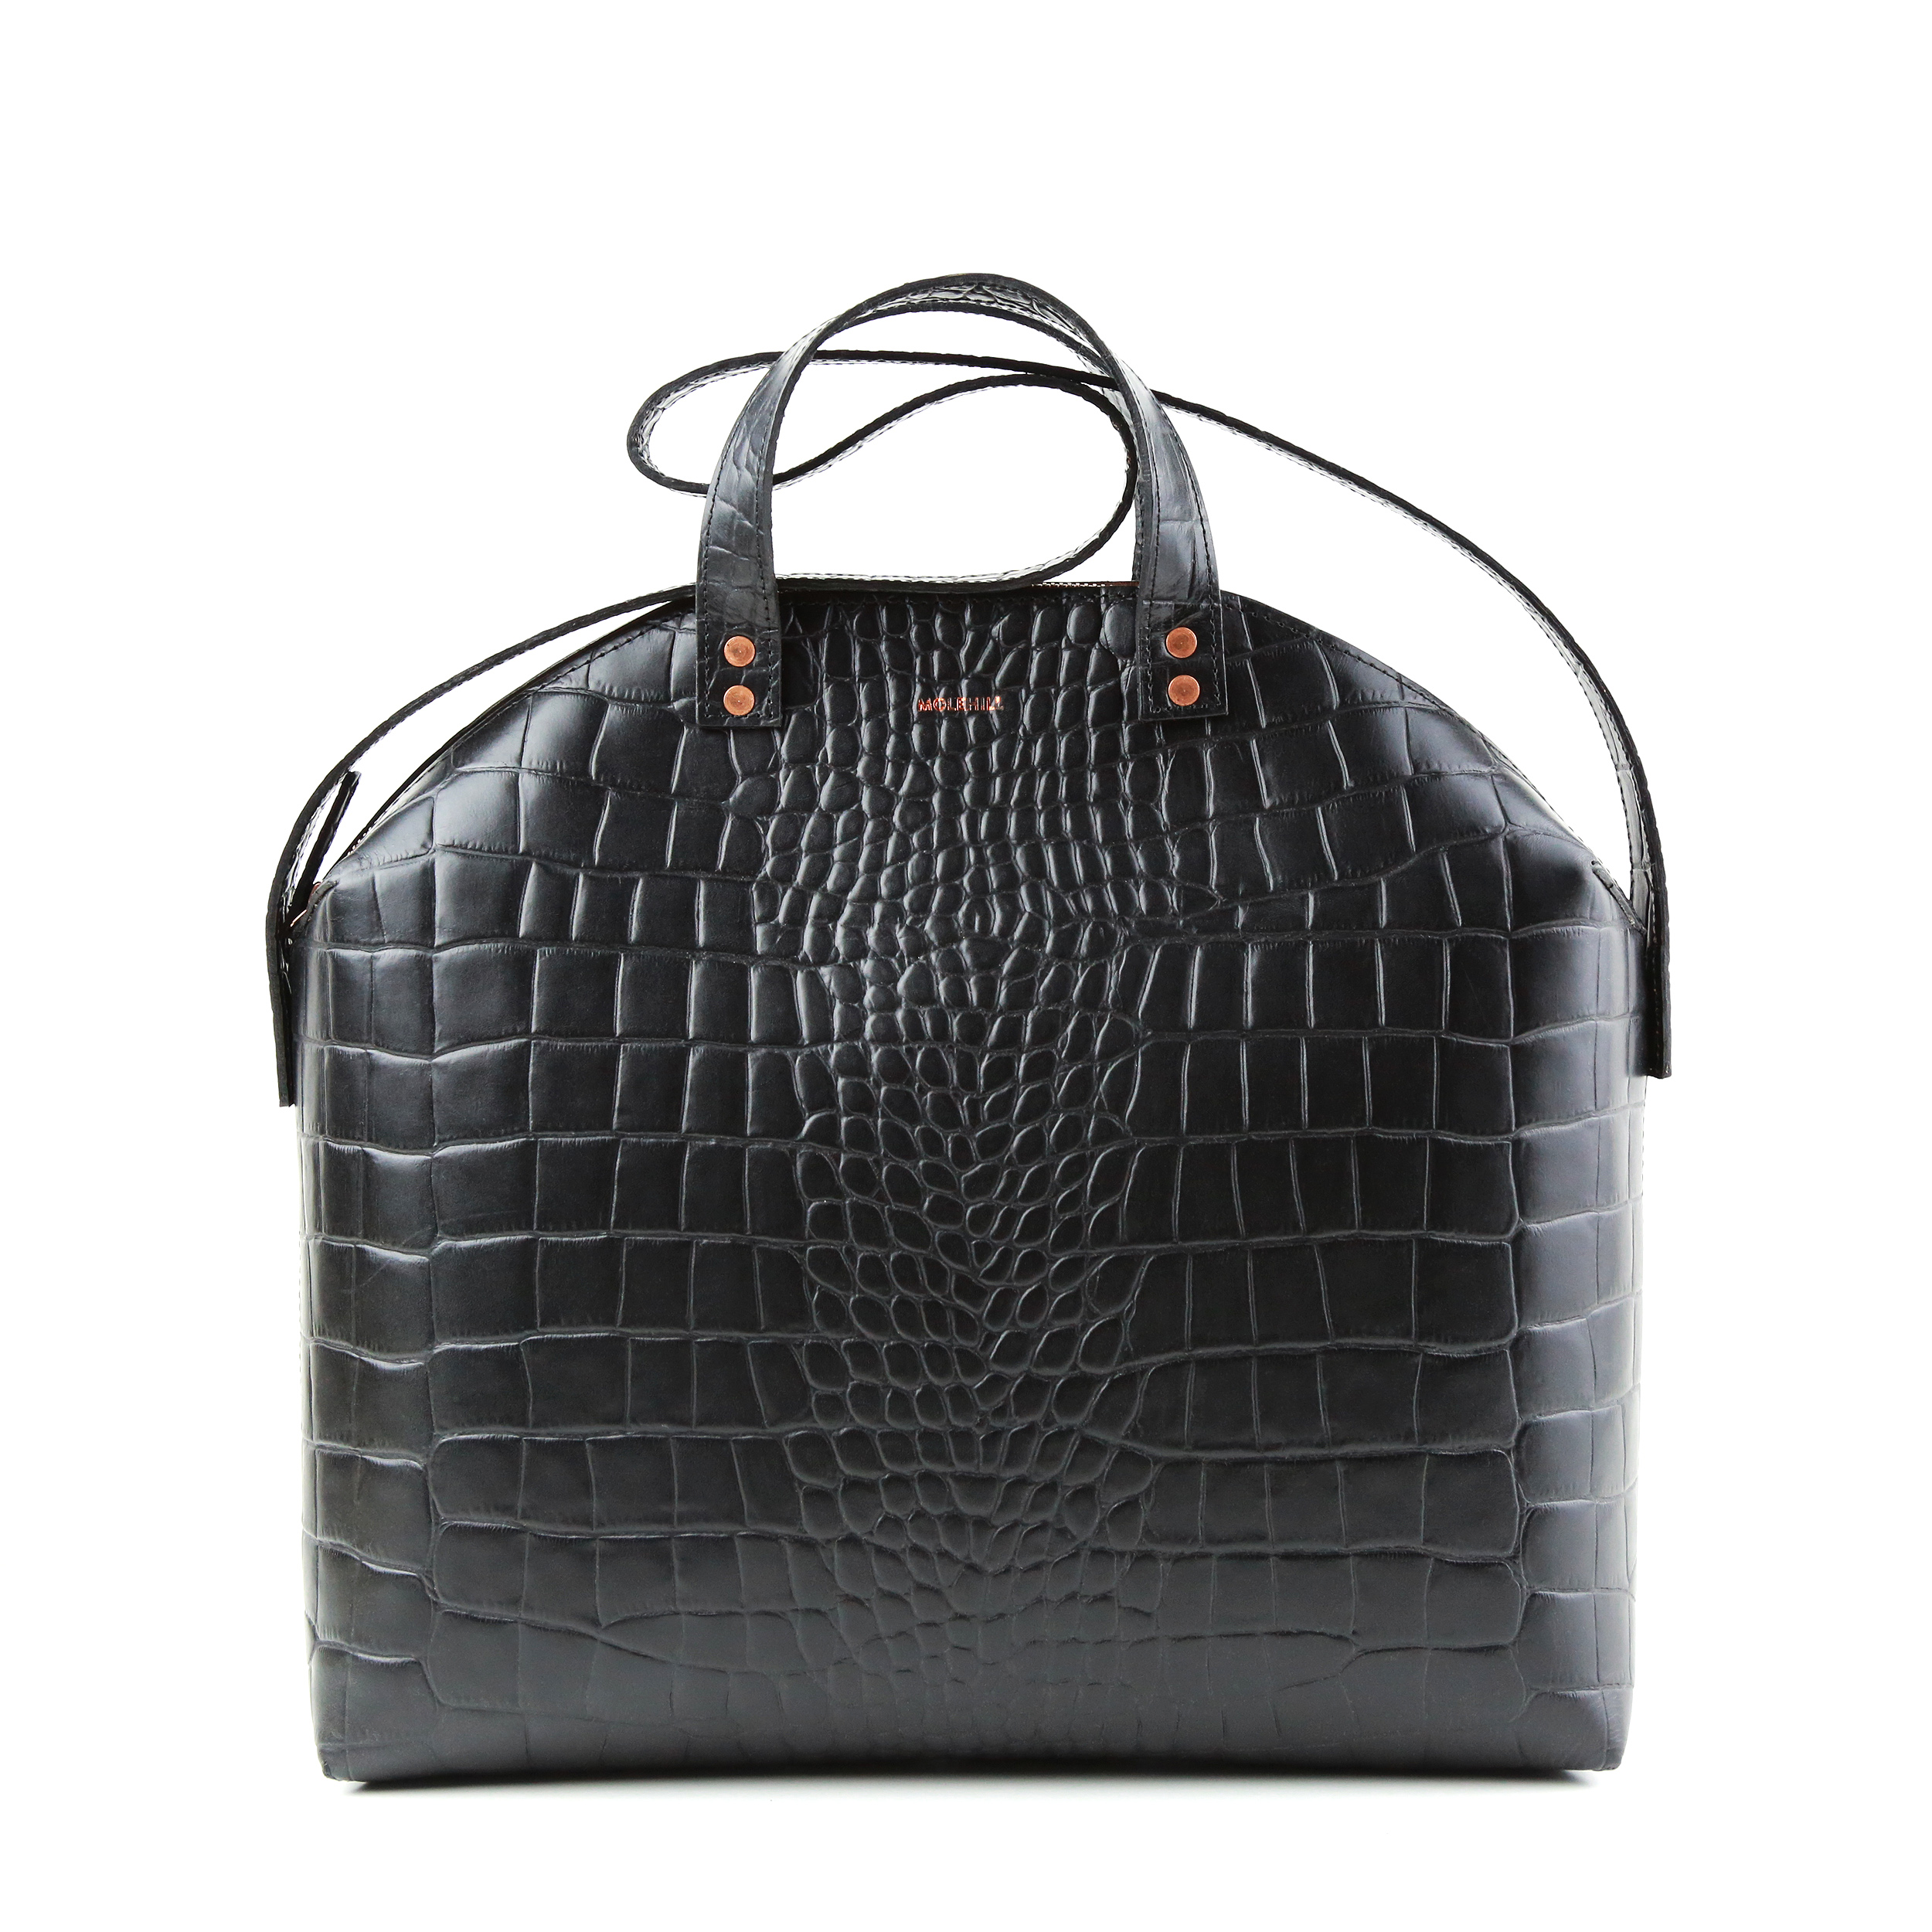 MADURA Handbag Croco Black Sample Sale-1